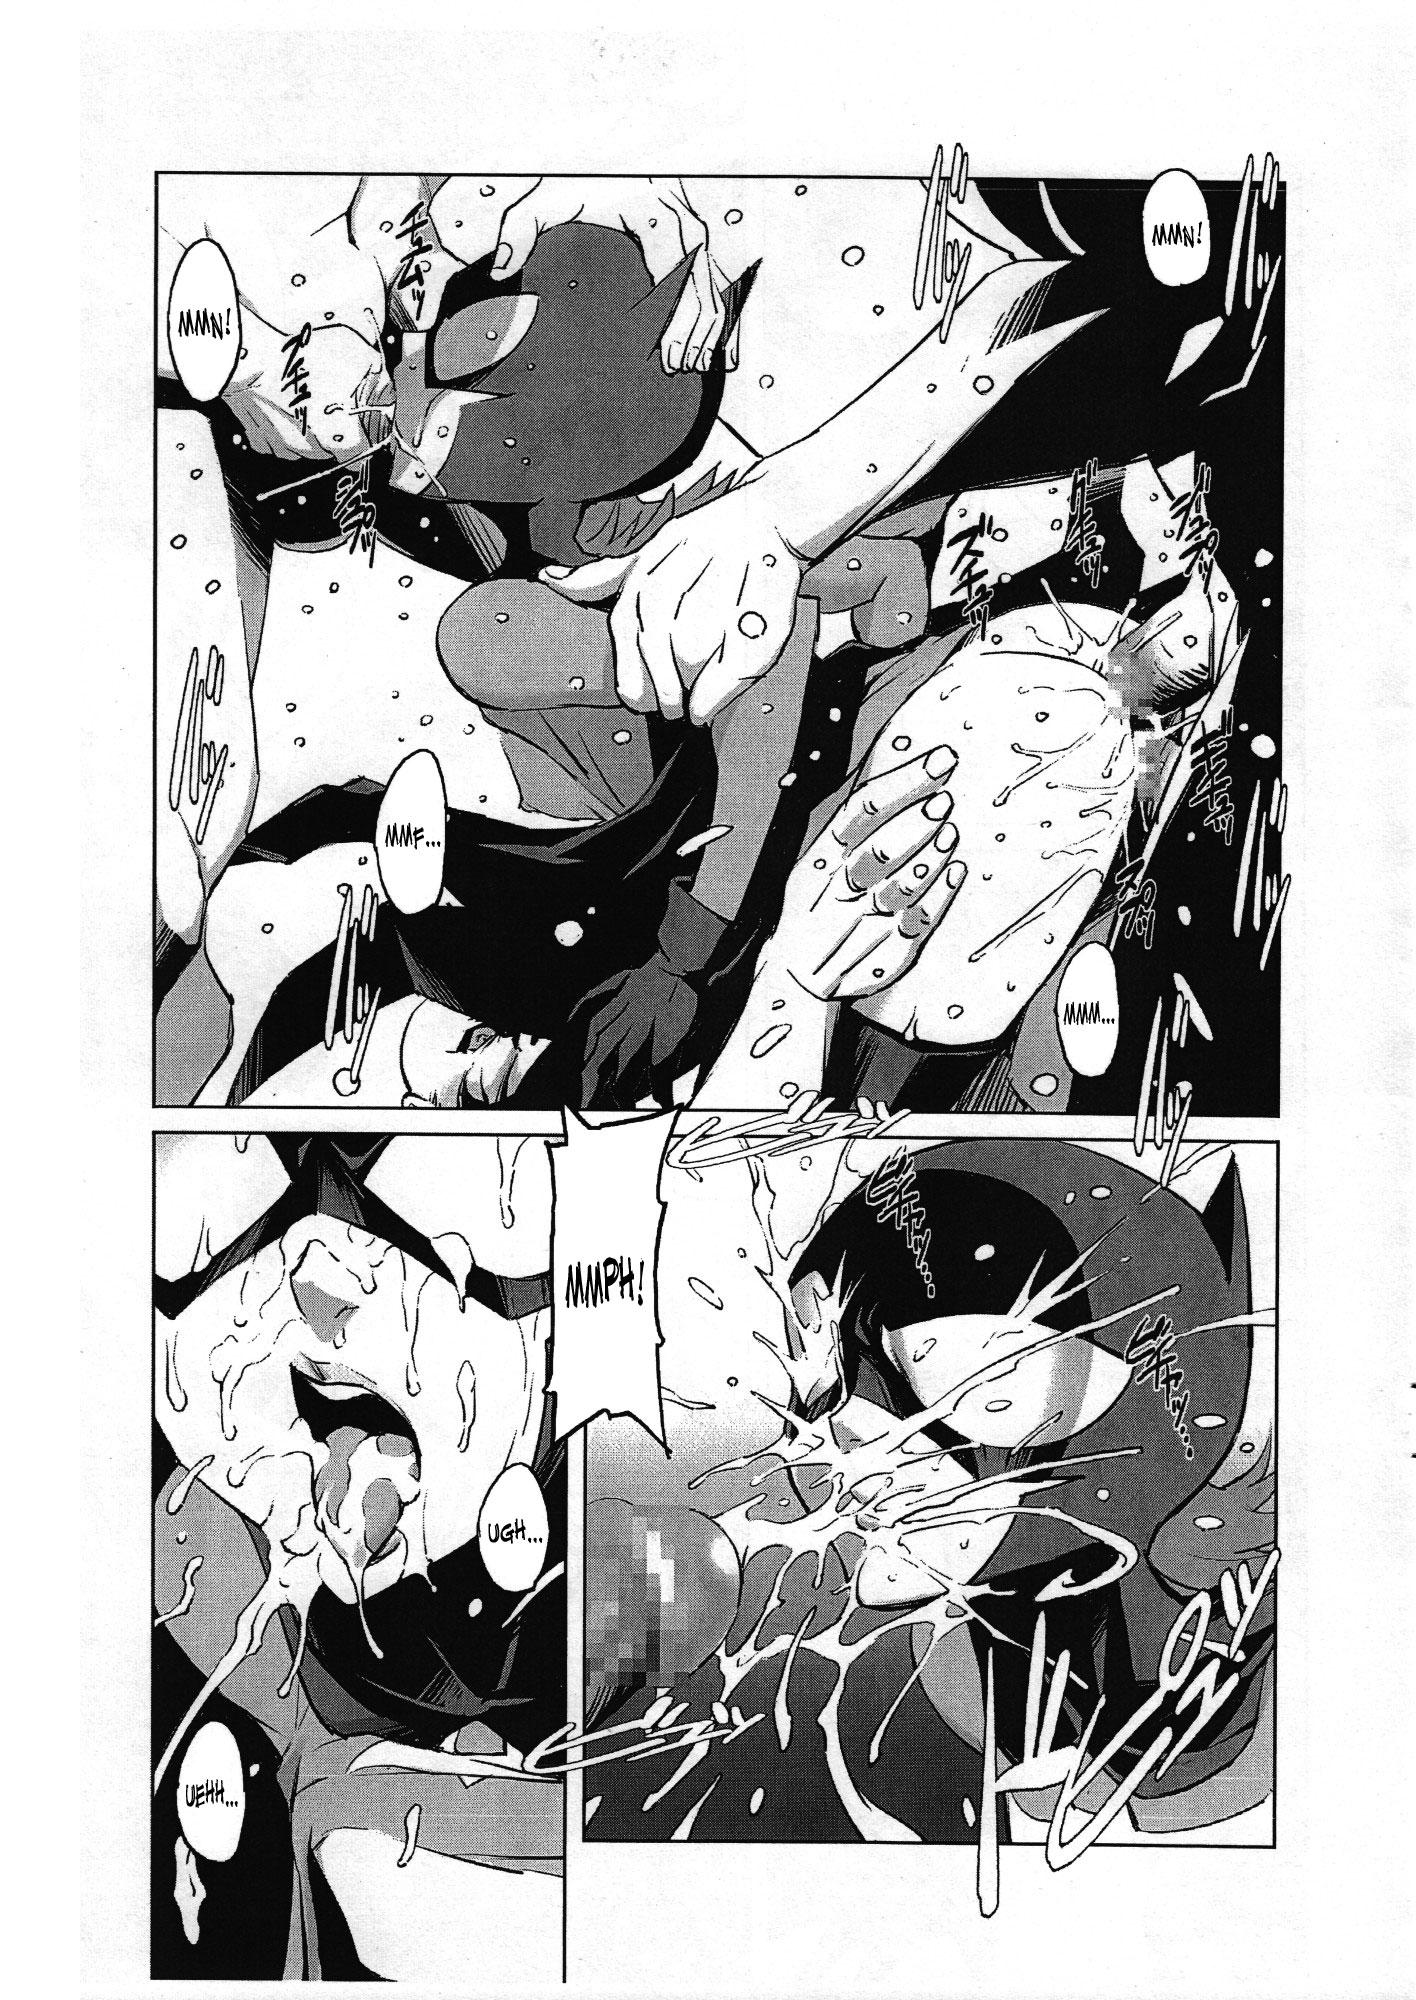 Хентай комиксы бэтмена 17 фотография